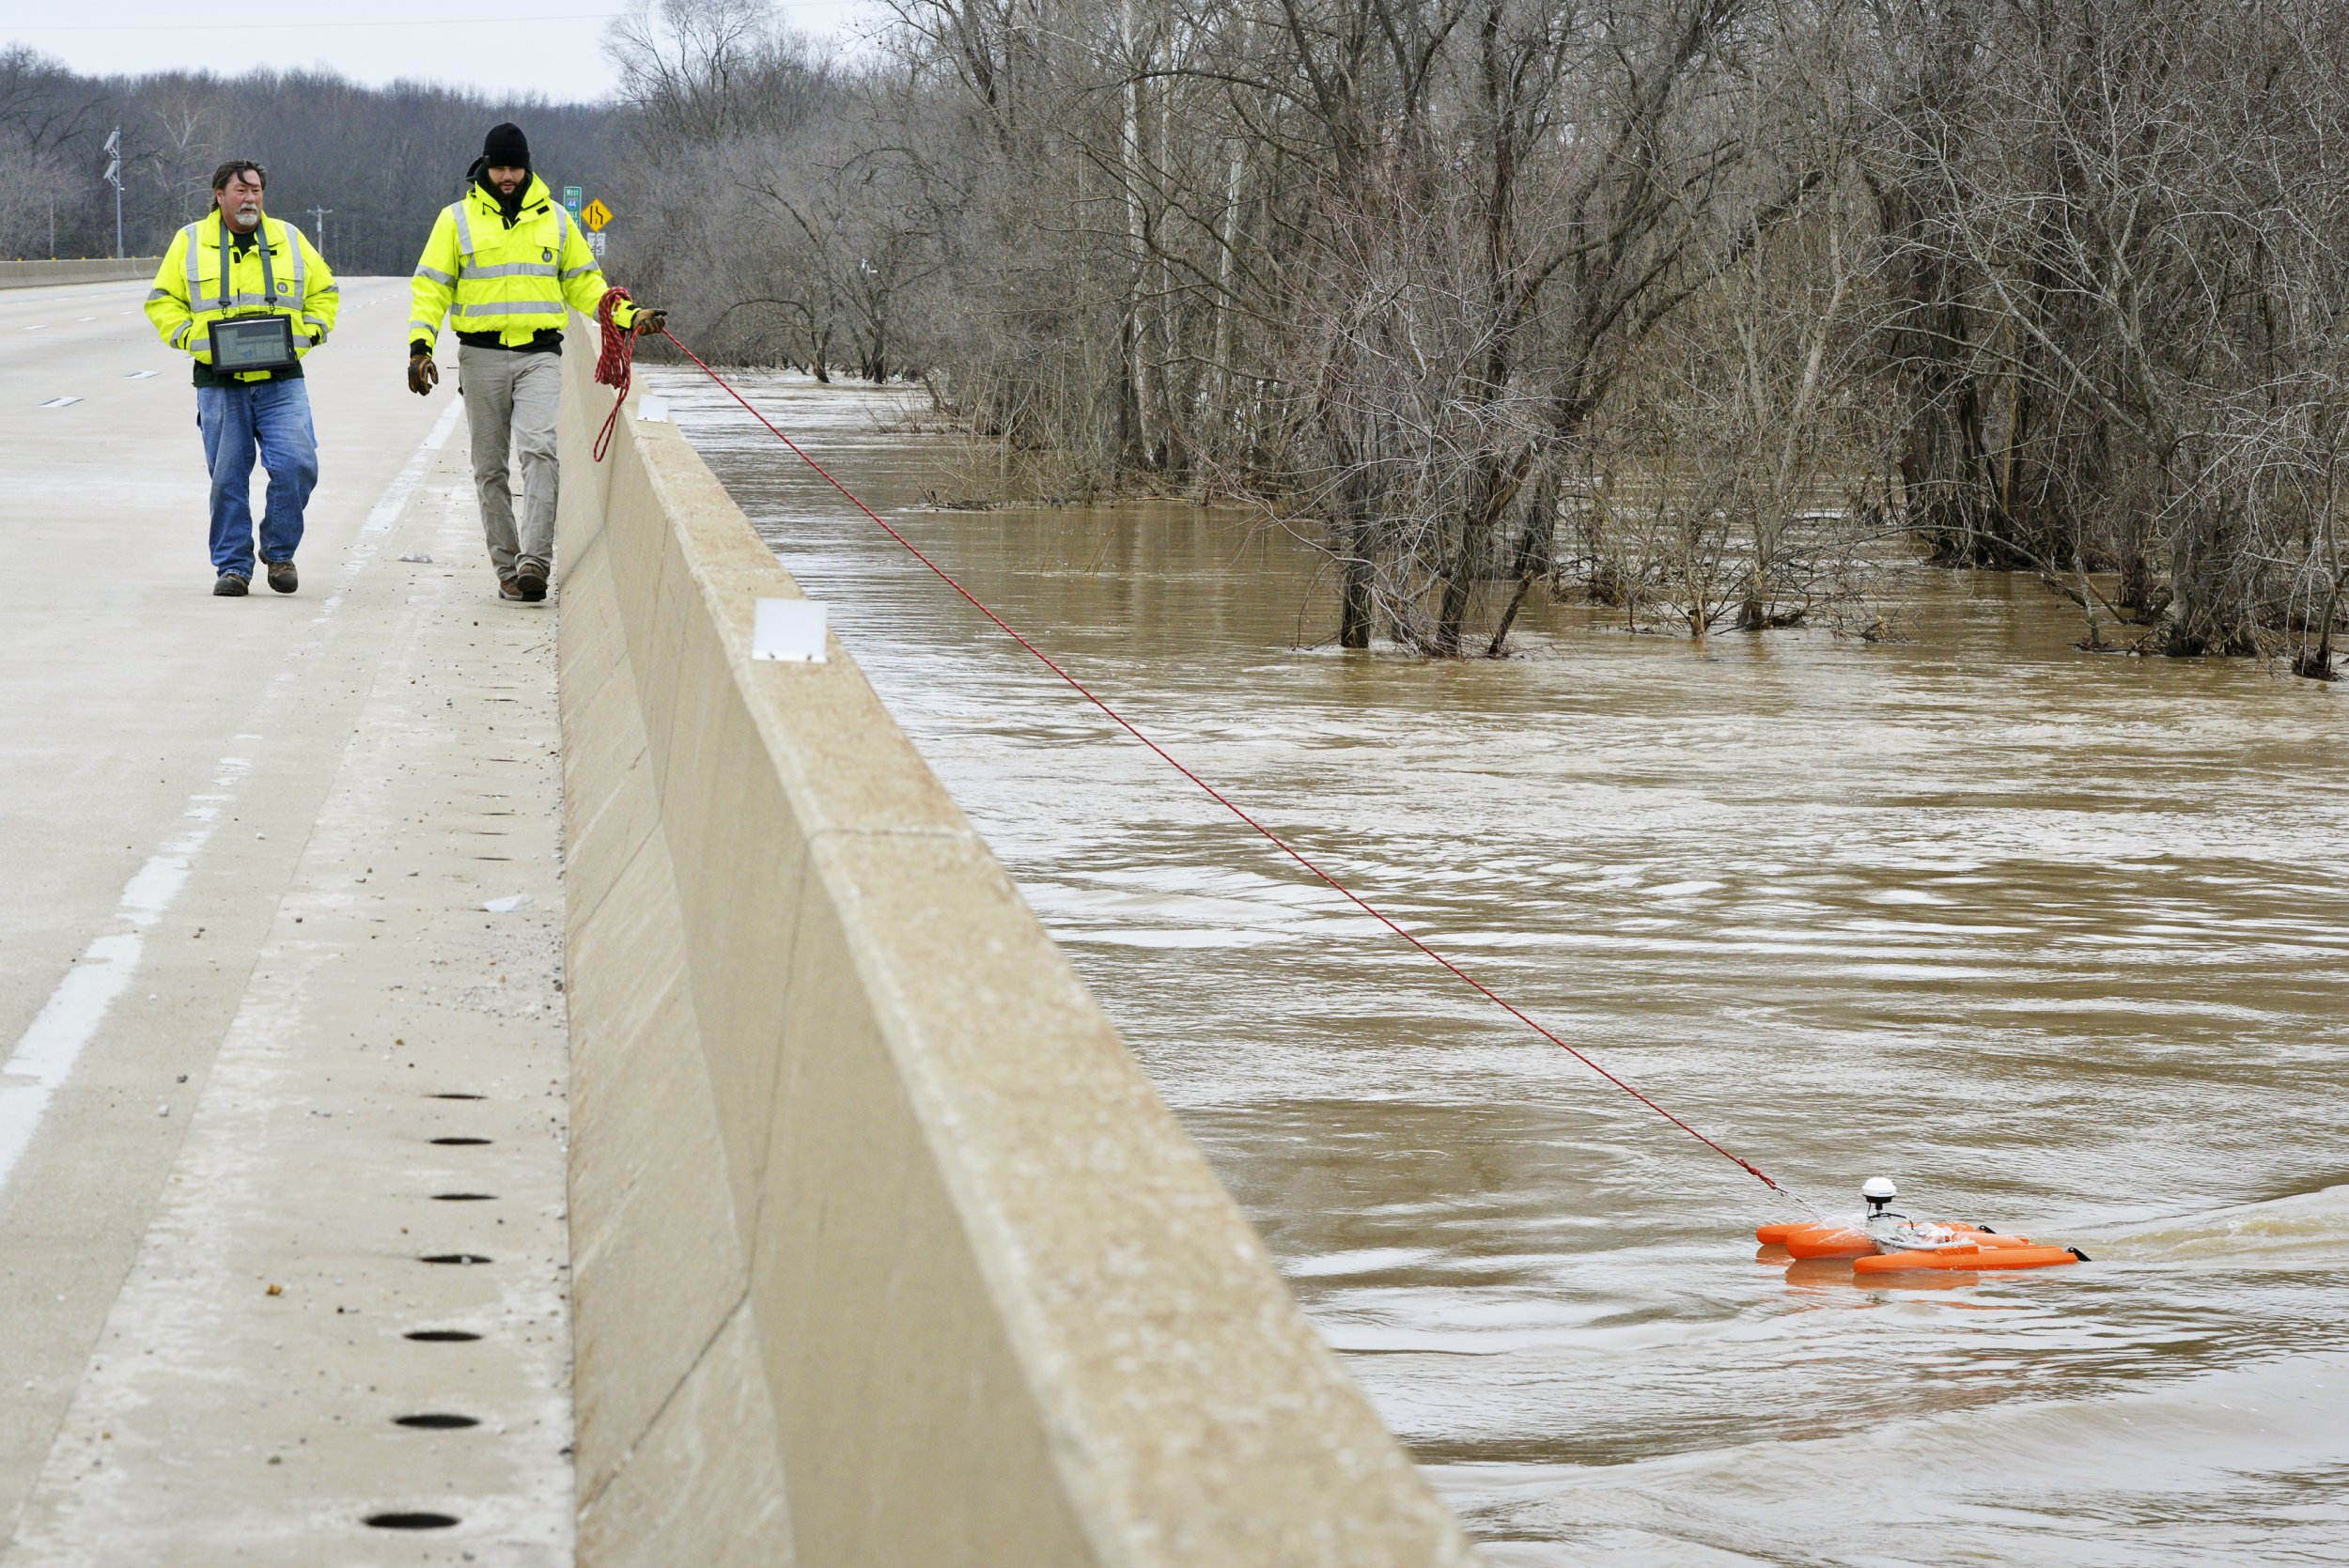 Missouri Driving Record >> Nine Million at Risk as Floods Swamp Missouri and Illinois